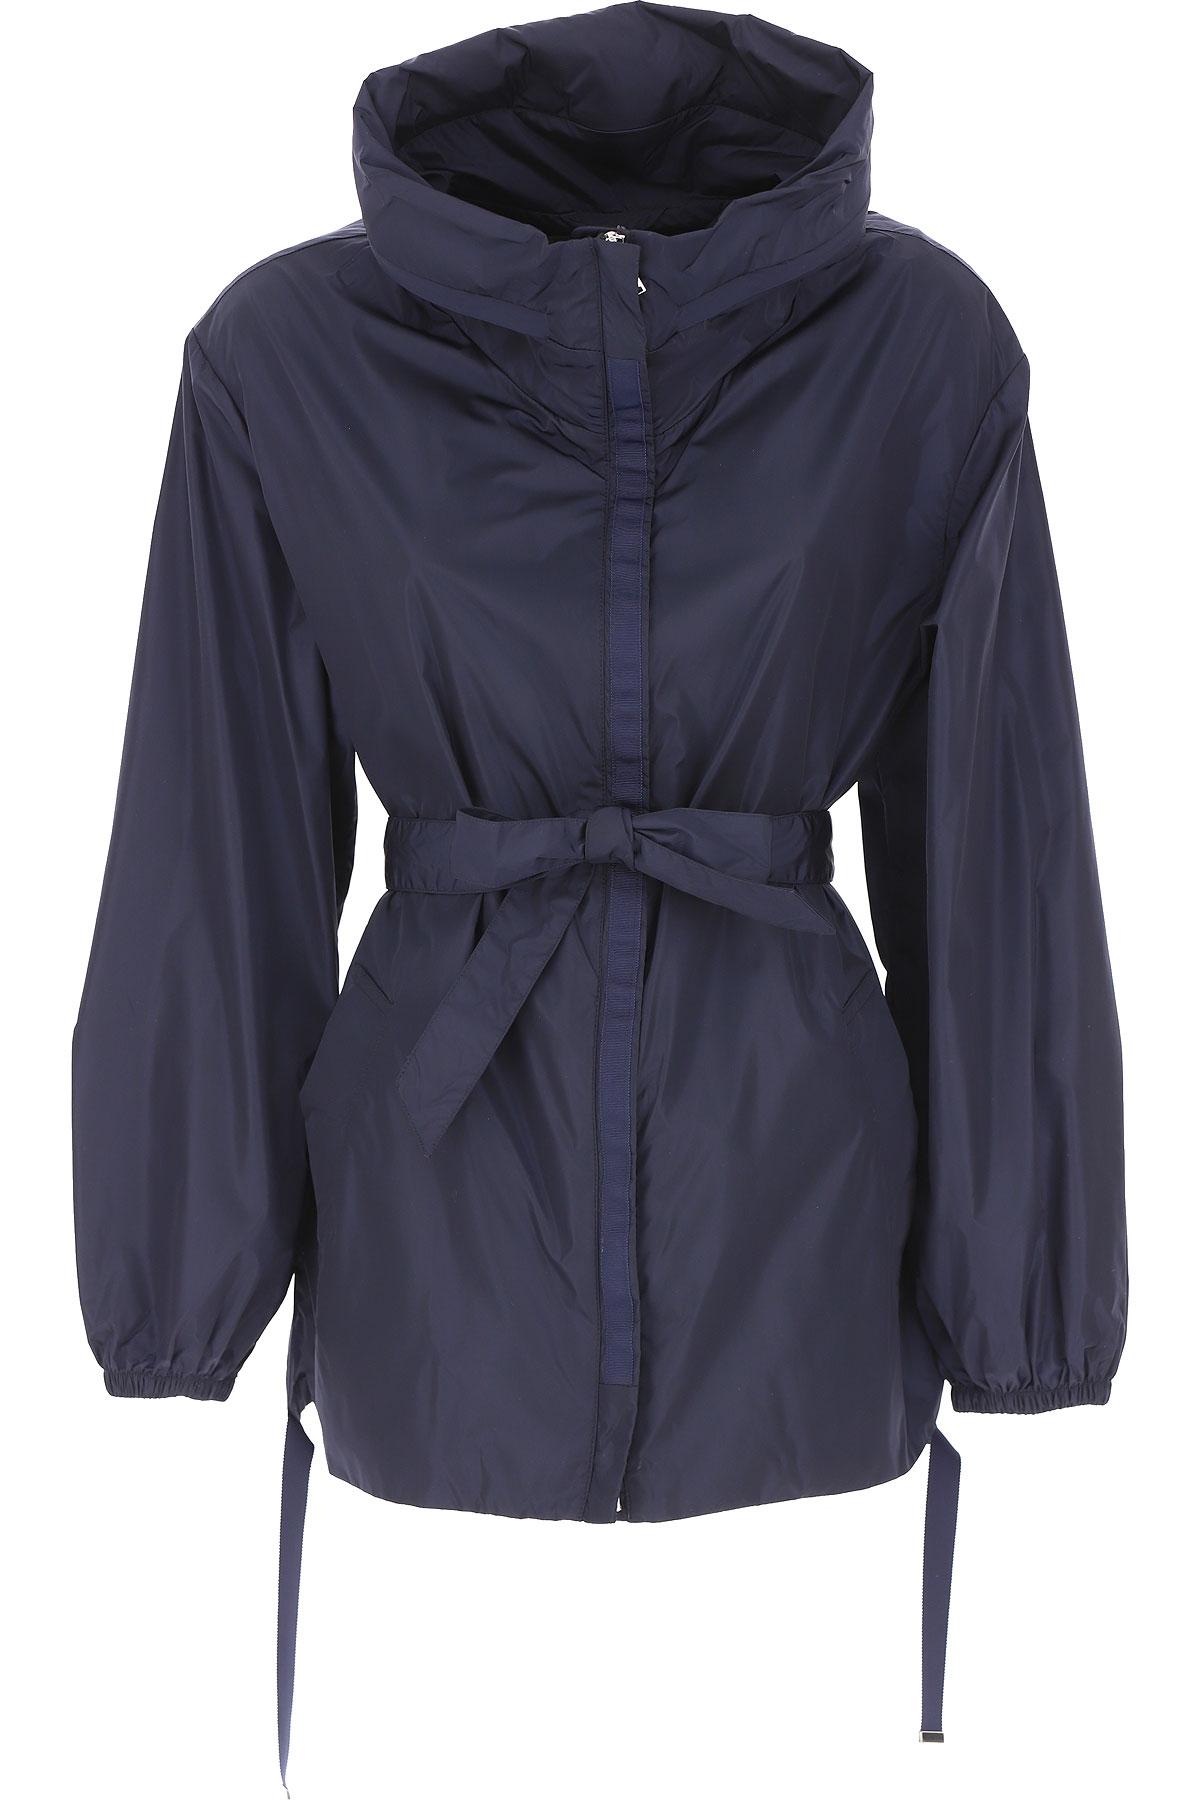 ADD Jacket for Women On Sale, Blue Ink, polyamide, 2019, 10 12 6 8